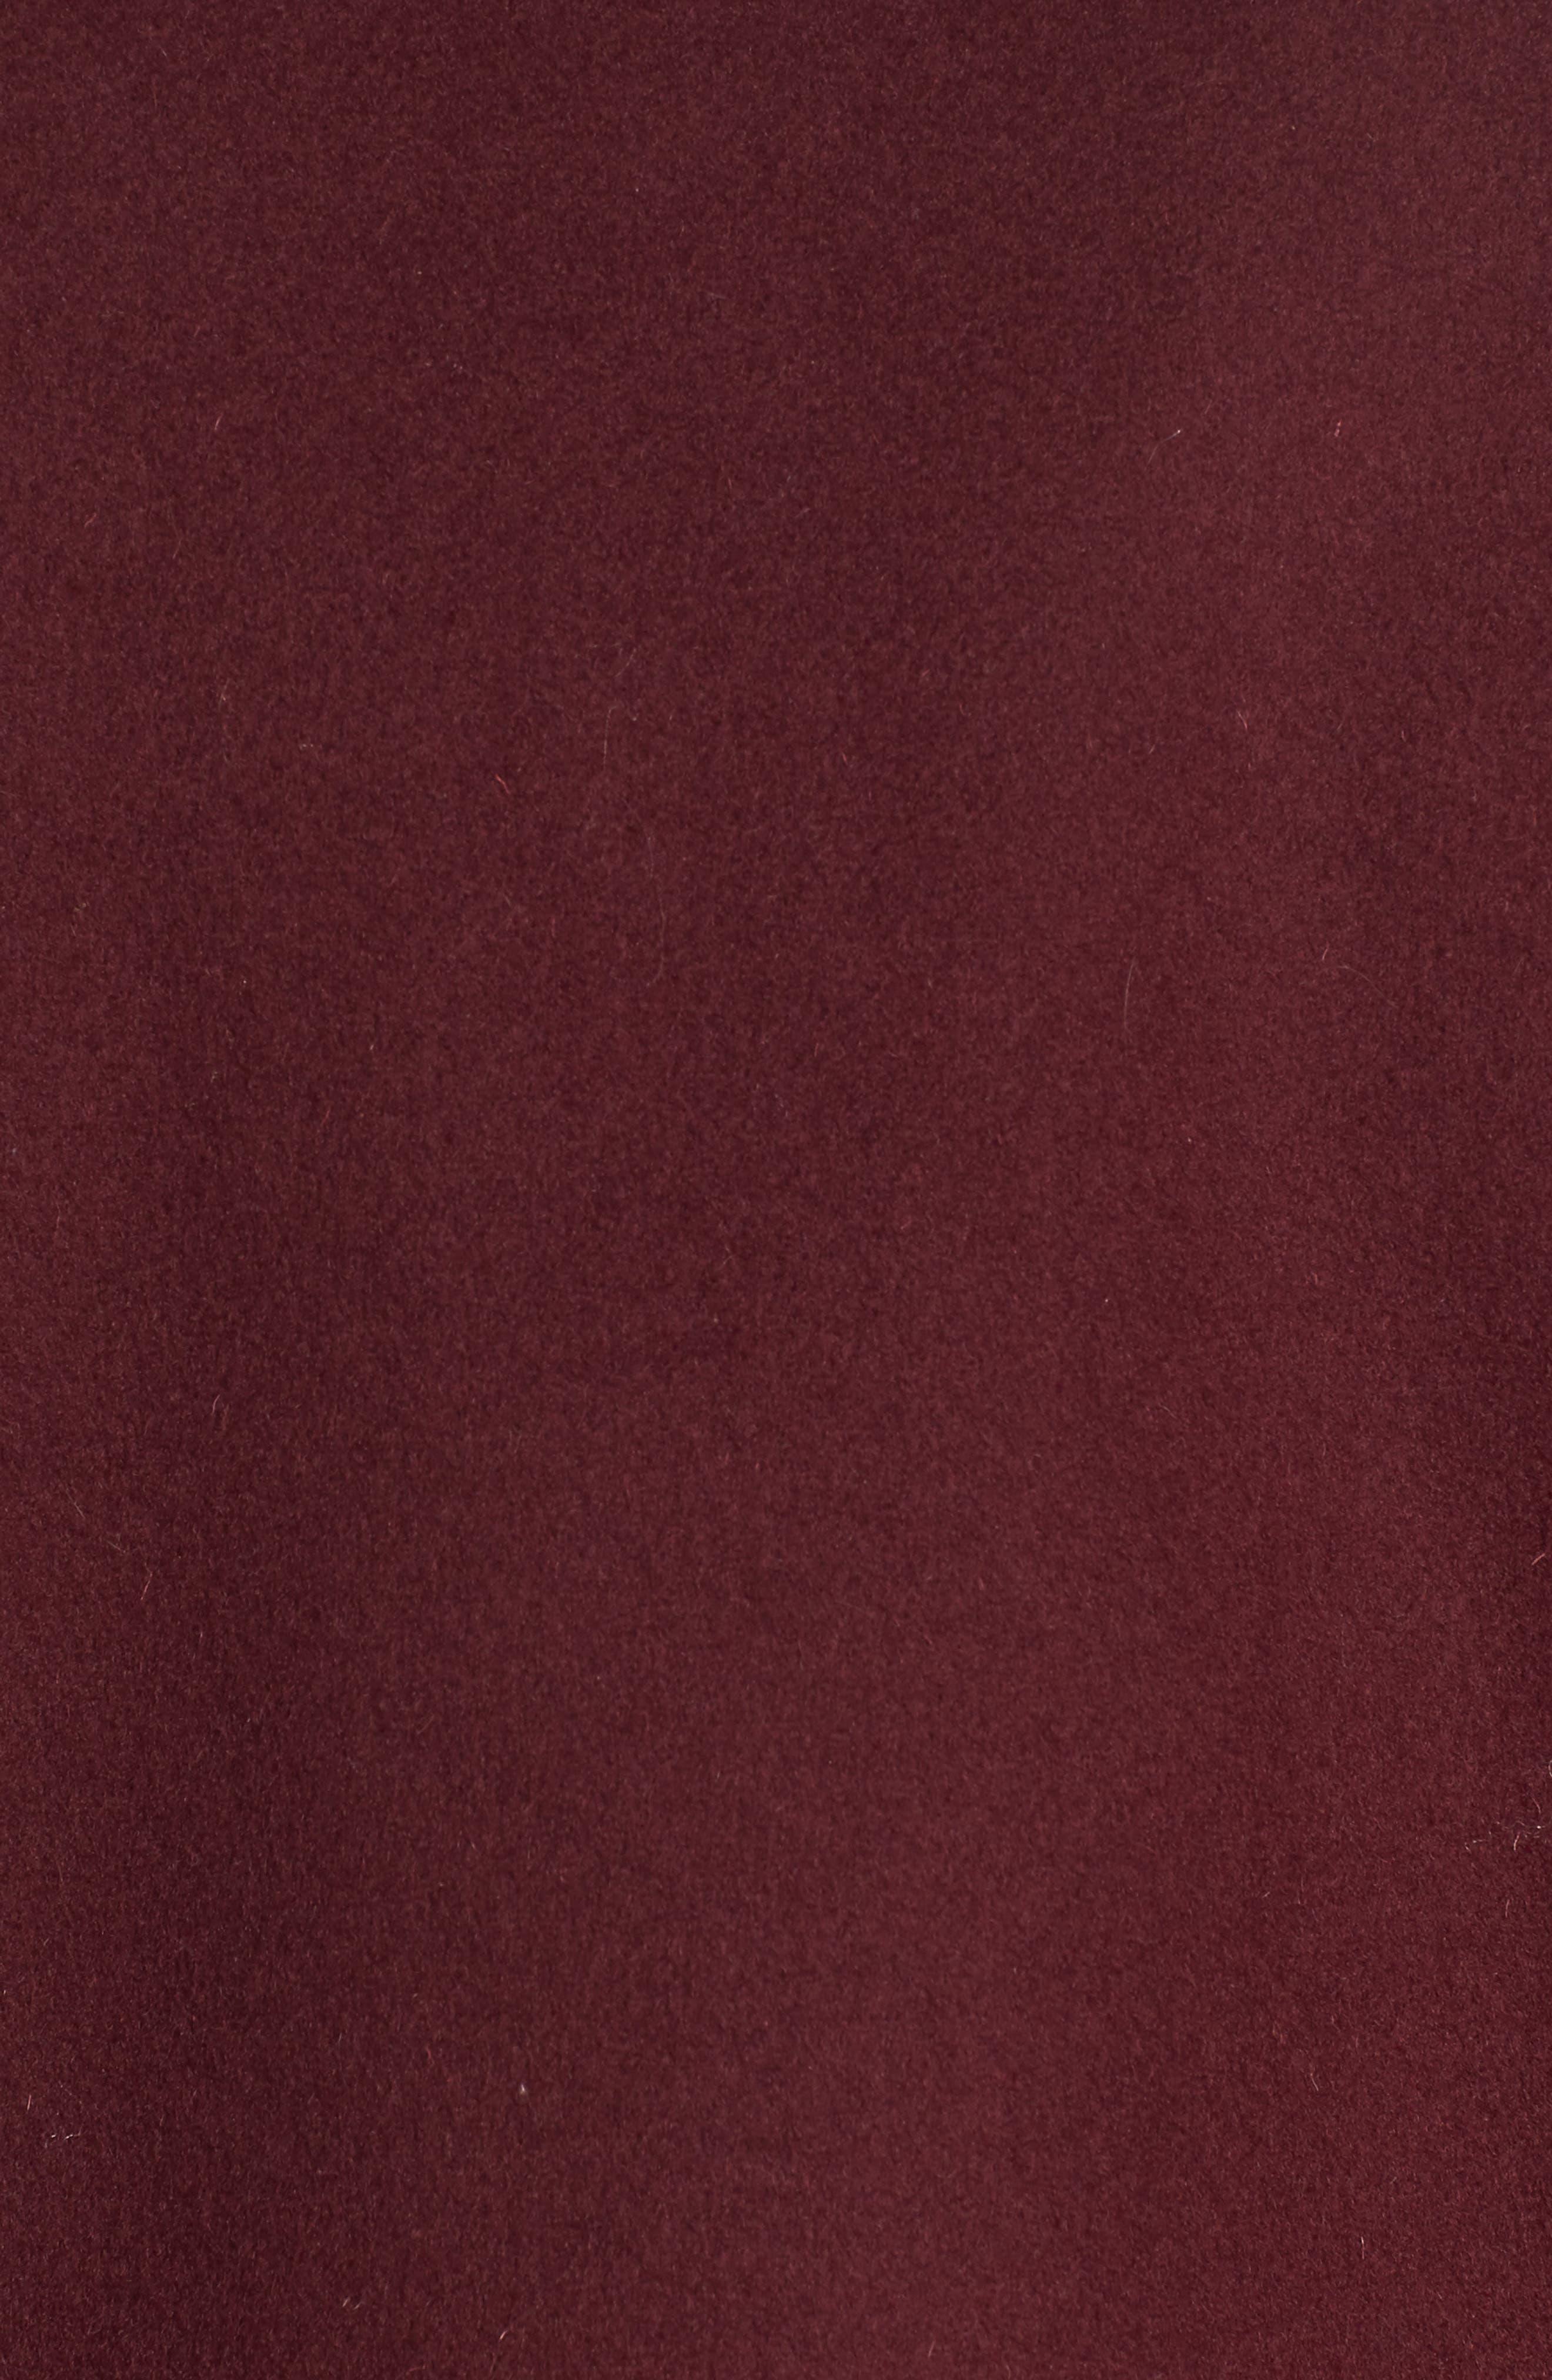 Pacifico Jacket,                             Alternate thumbnail 5, color,                             Elixir